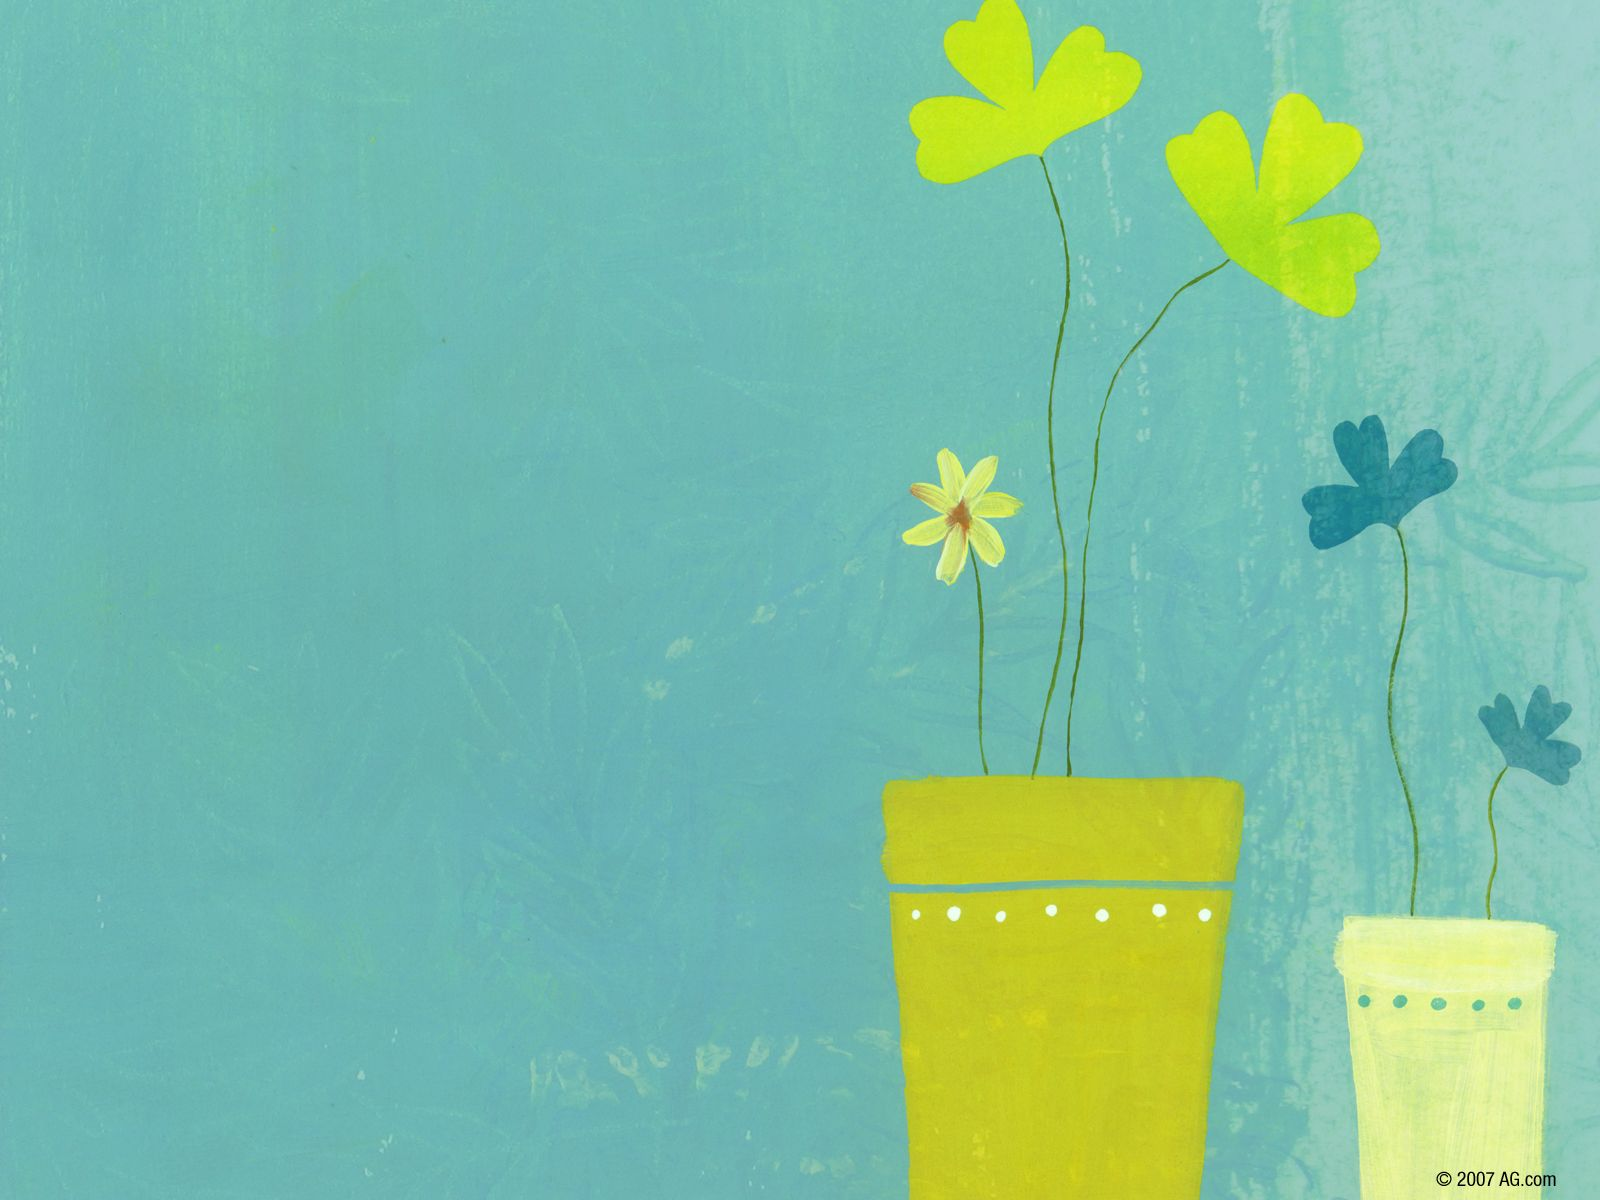 Plants America Greetings Wallpapers